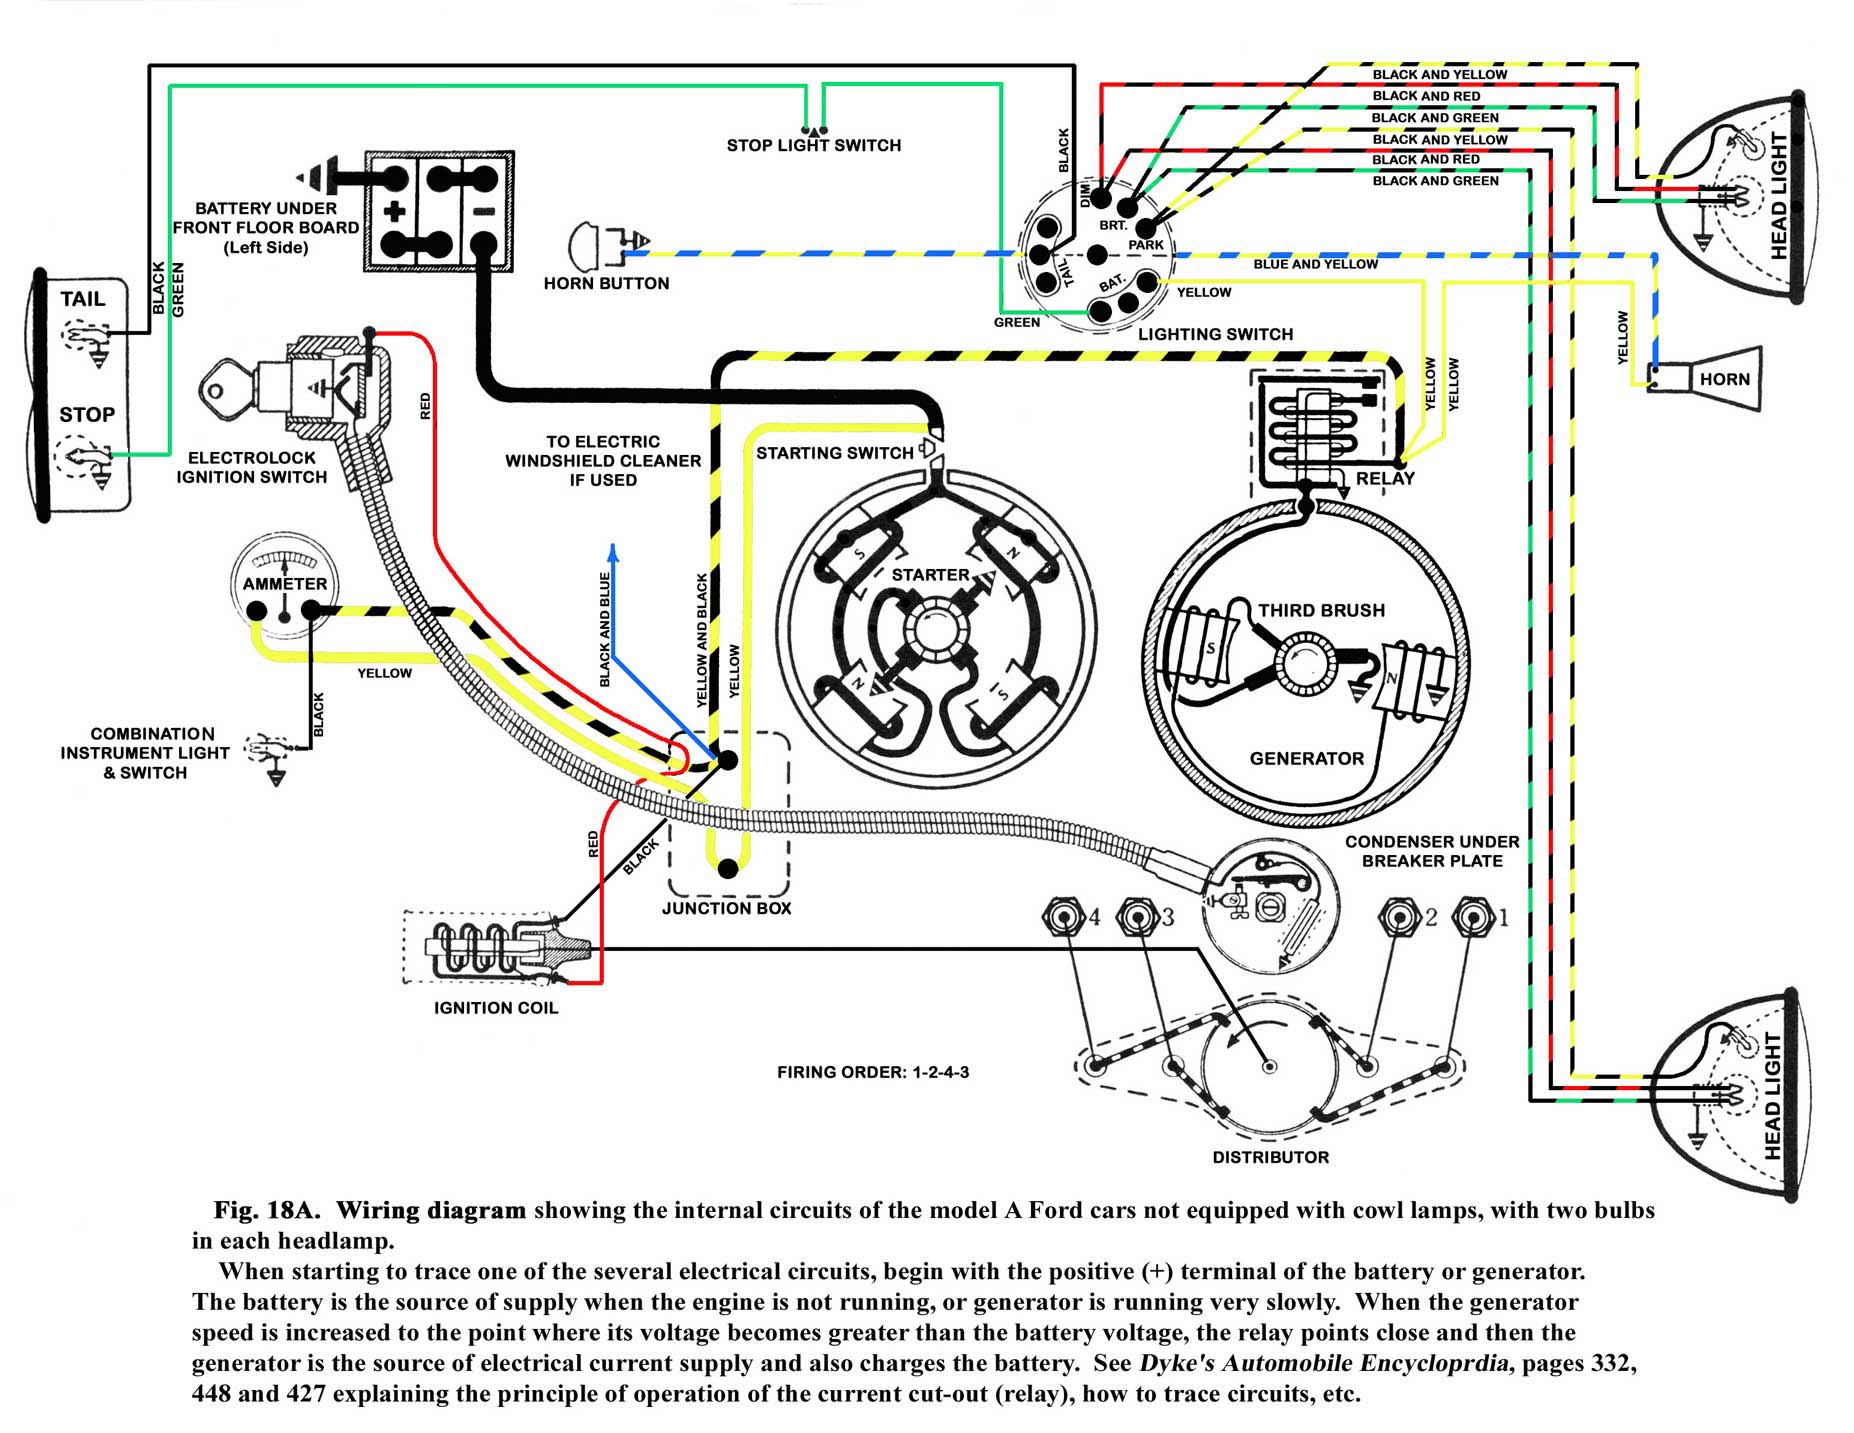 Generator Voltage Regulator Wiring Diagram Harley | Wiring Diagram - Harley Davidson Voltage Regulator Wiring Diagram